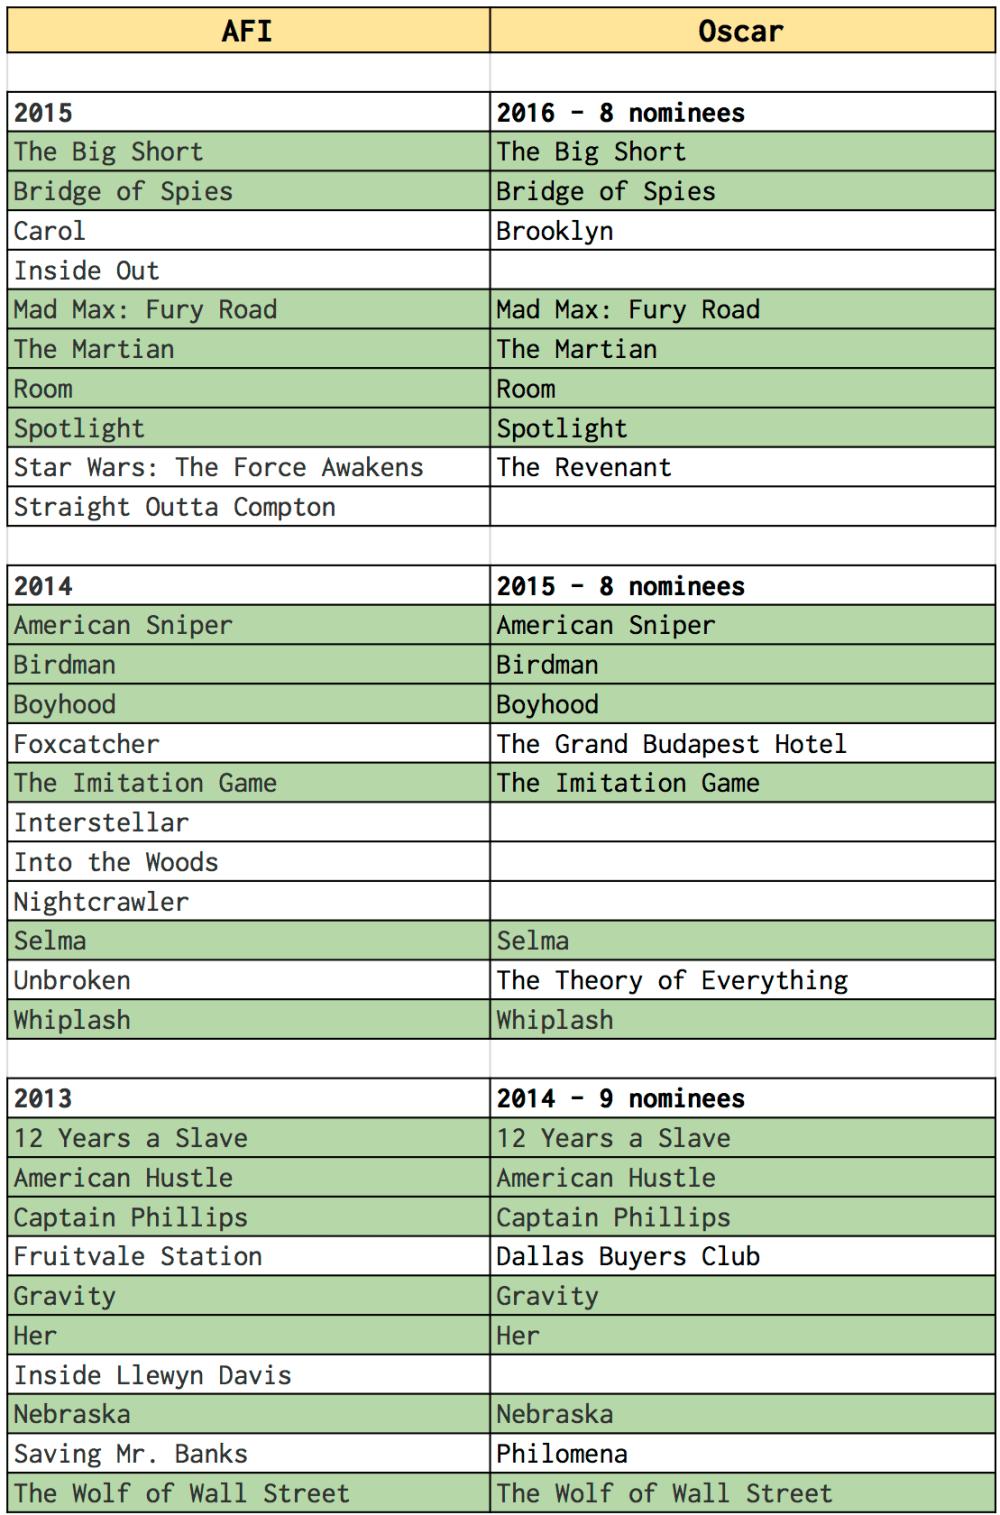 afi-v-oscar-2013-2015